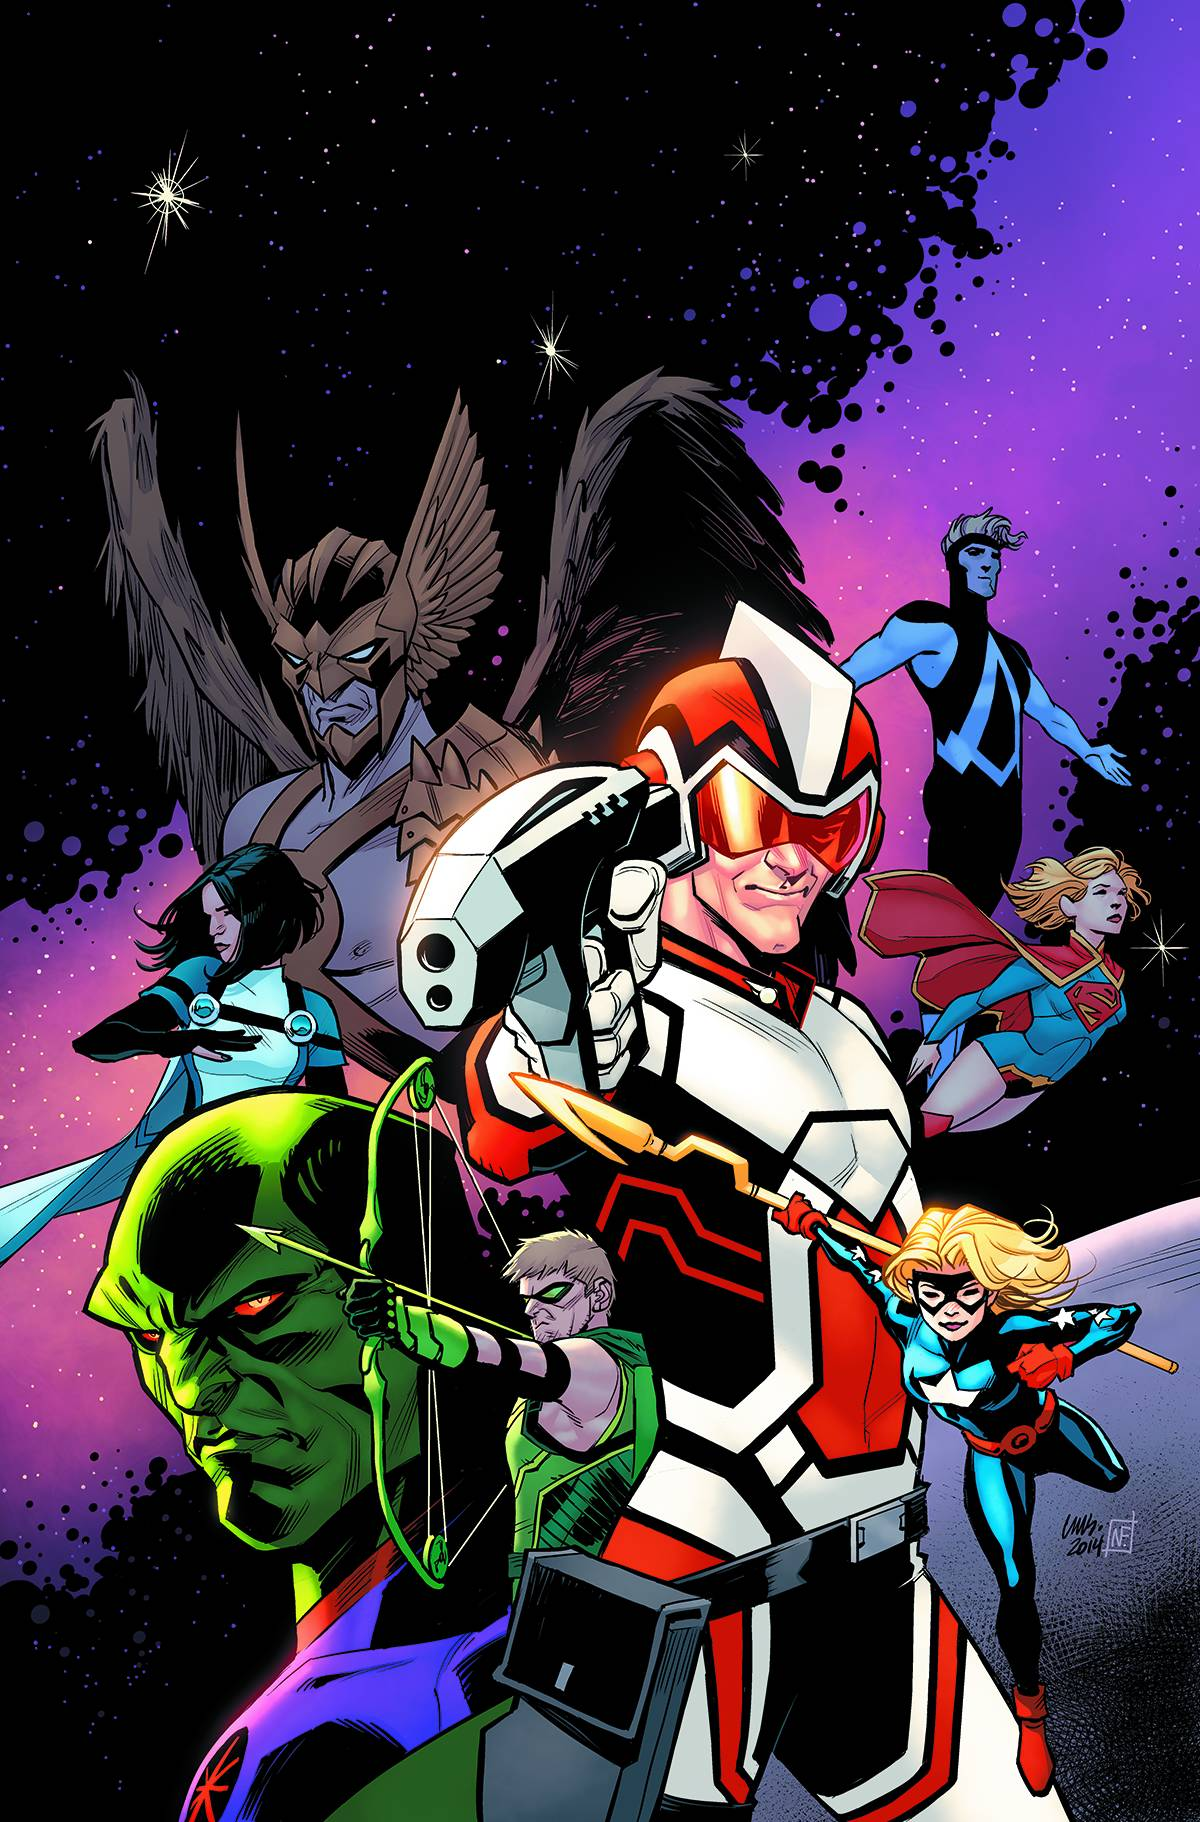 Justice League United Vol 1 5 Stewart Variant Textless.jpg